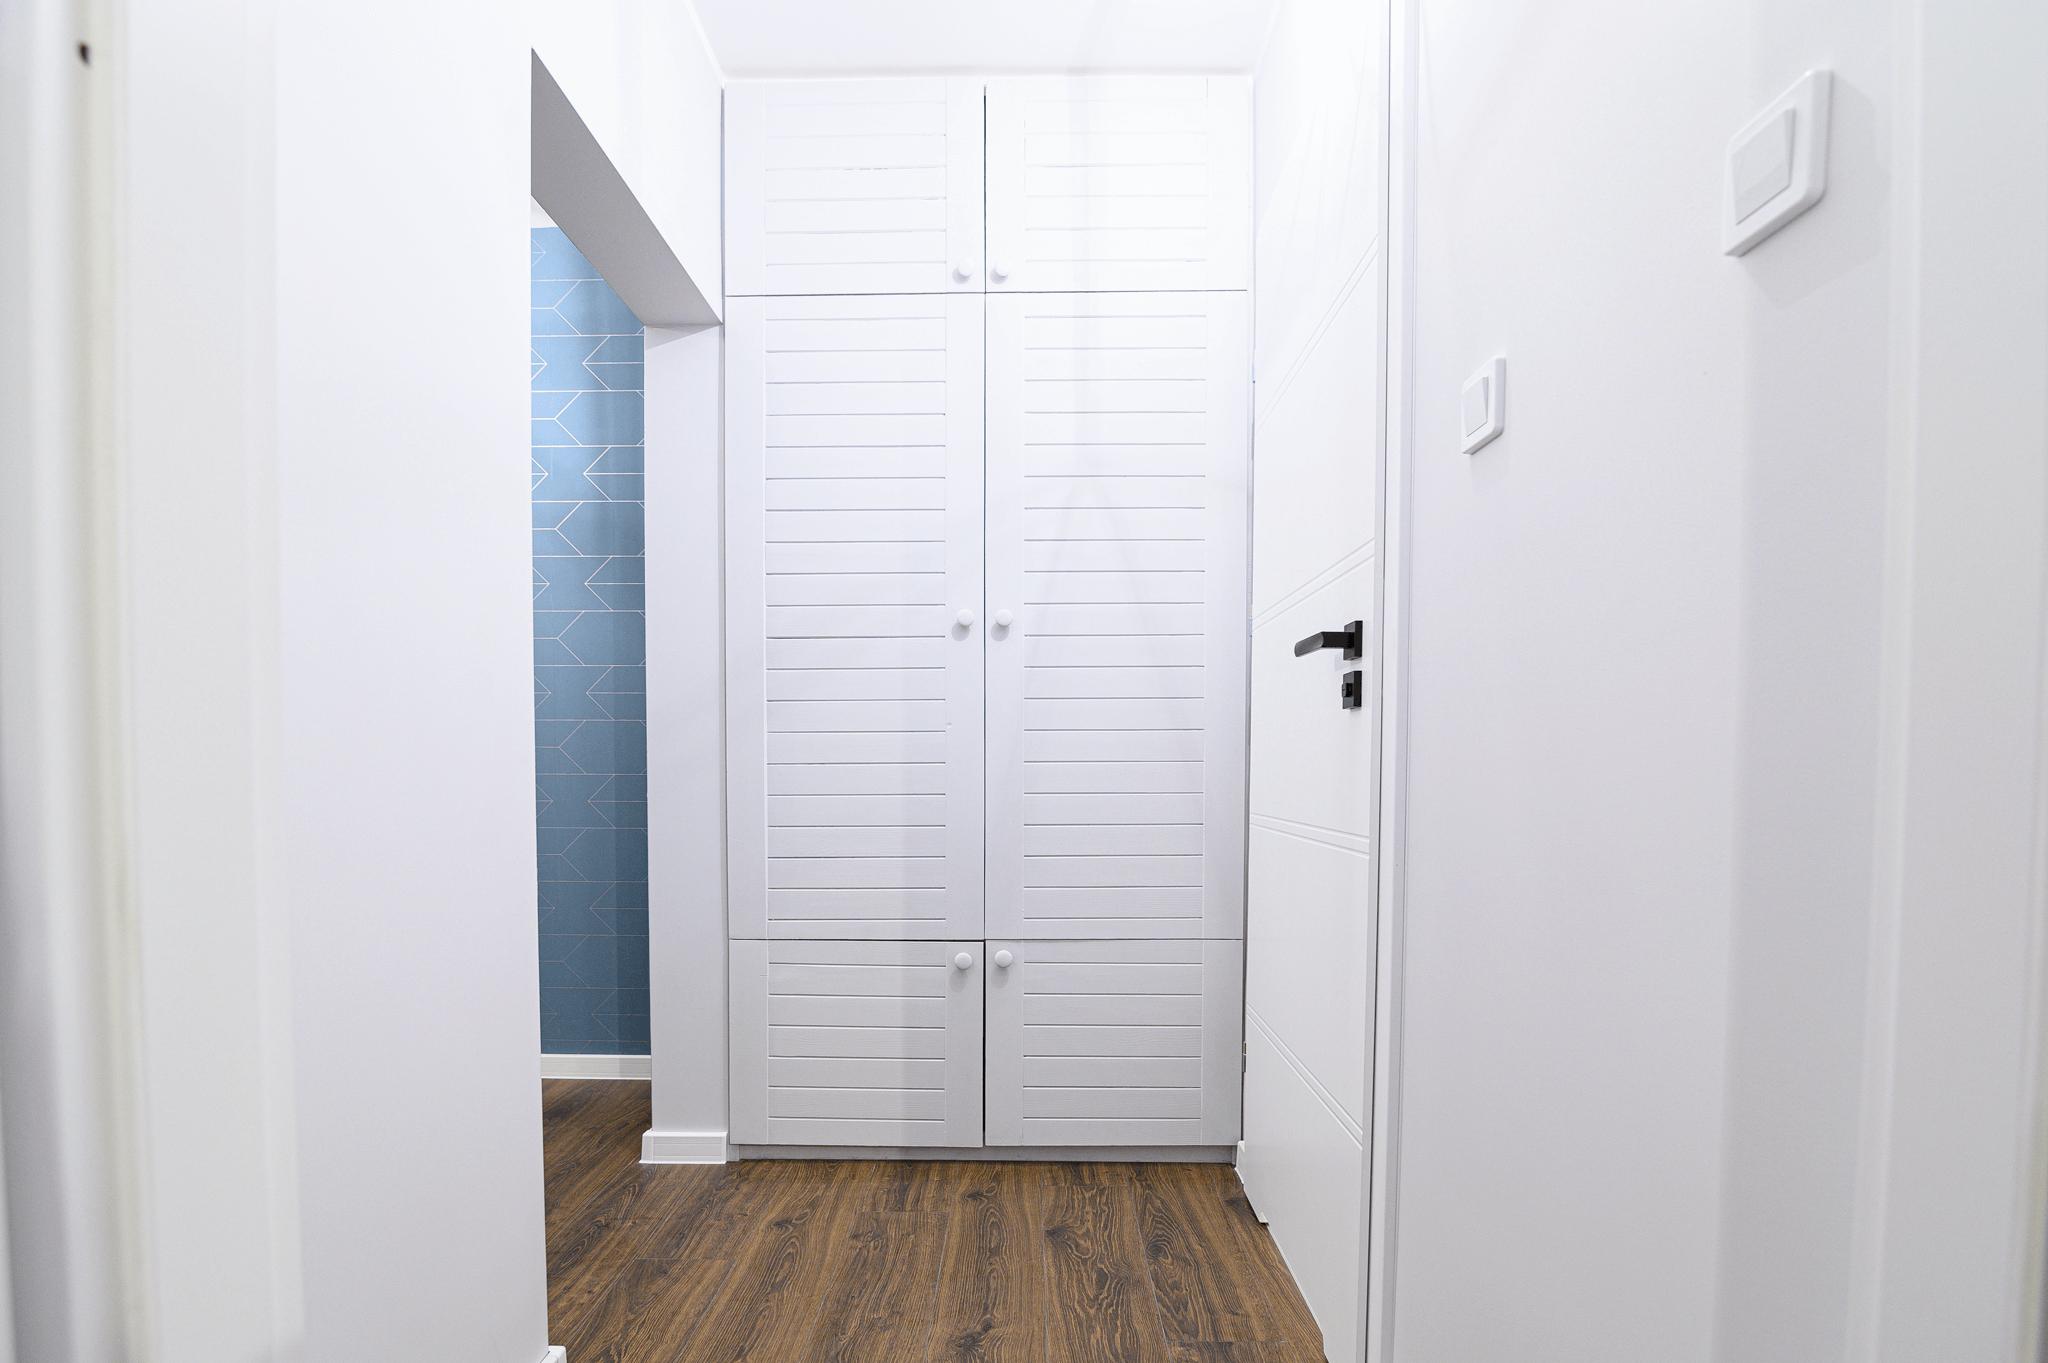 Home-Designers-os.-Orla-Bialego-05.png